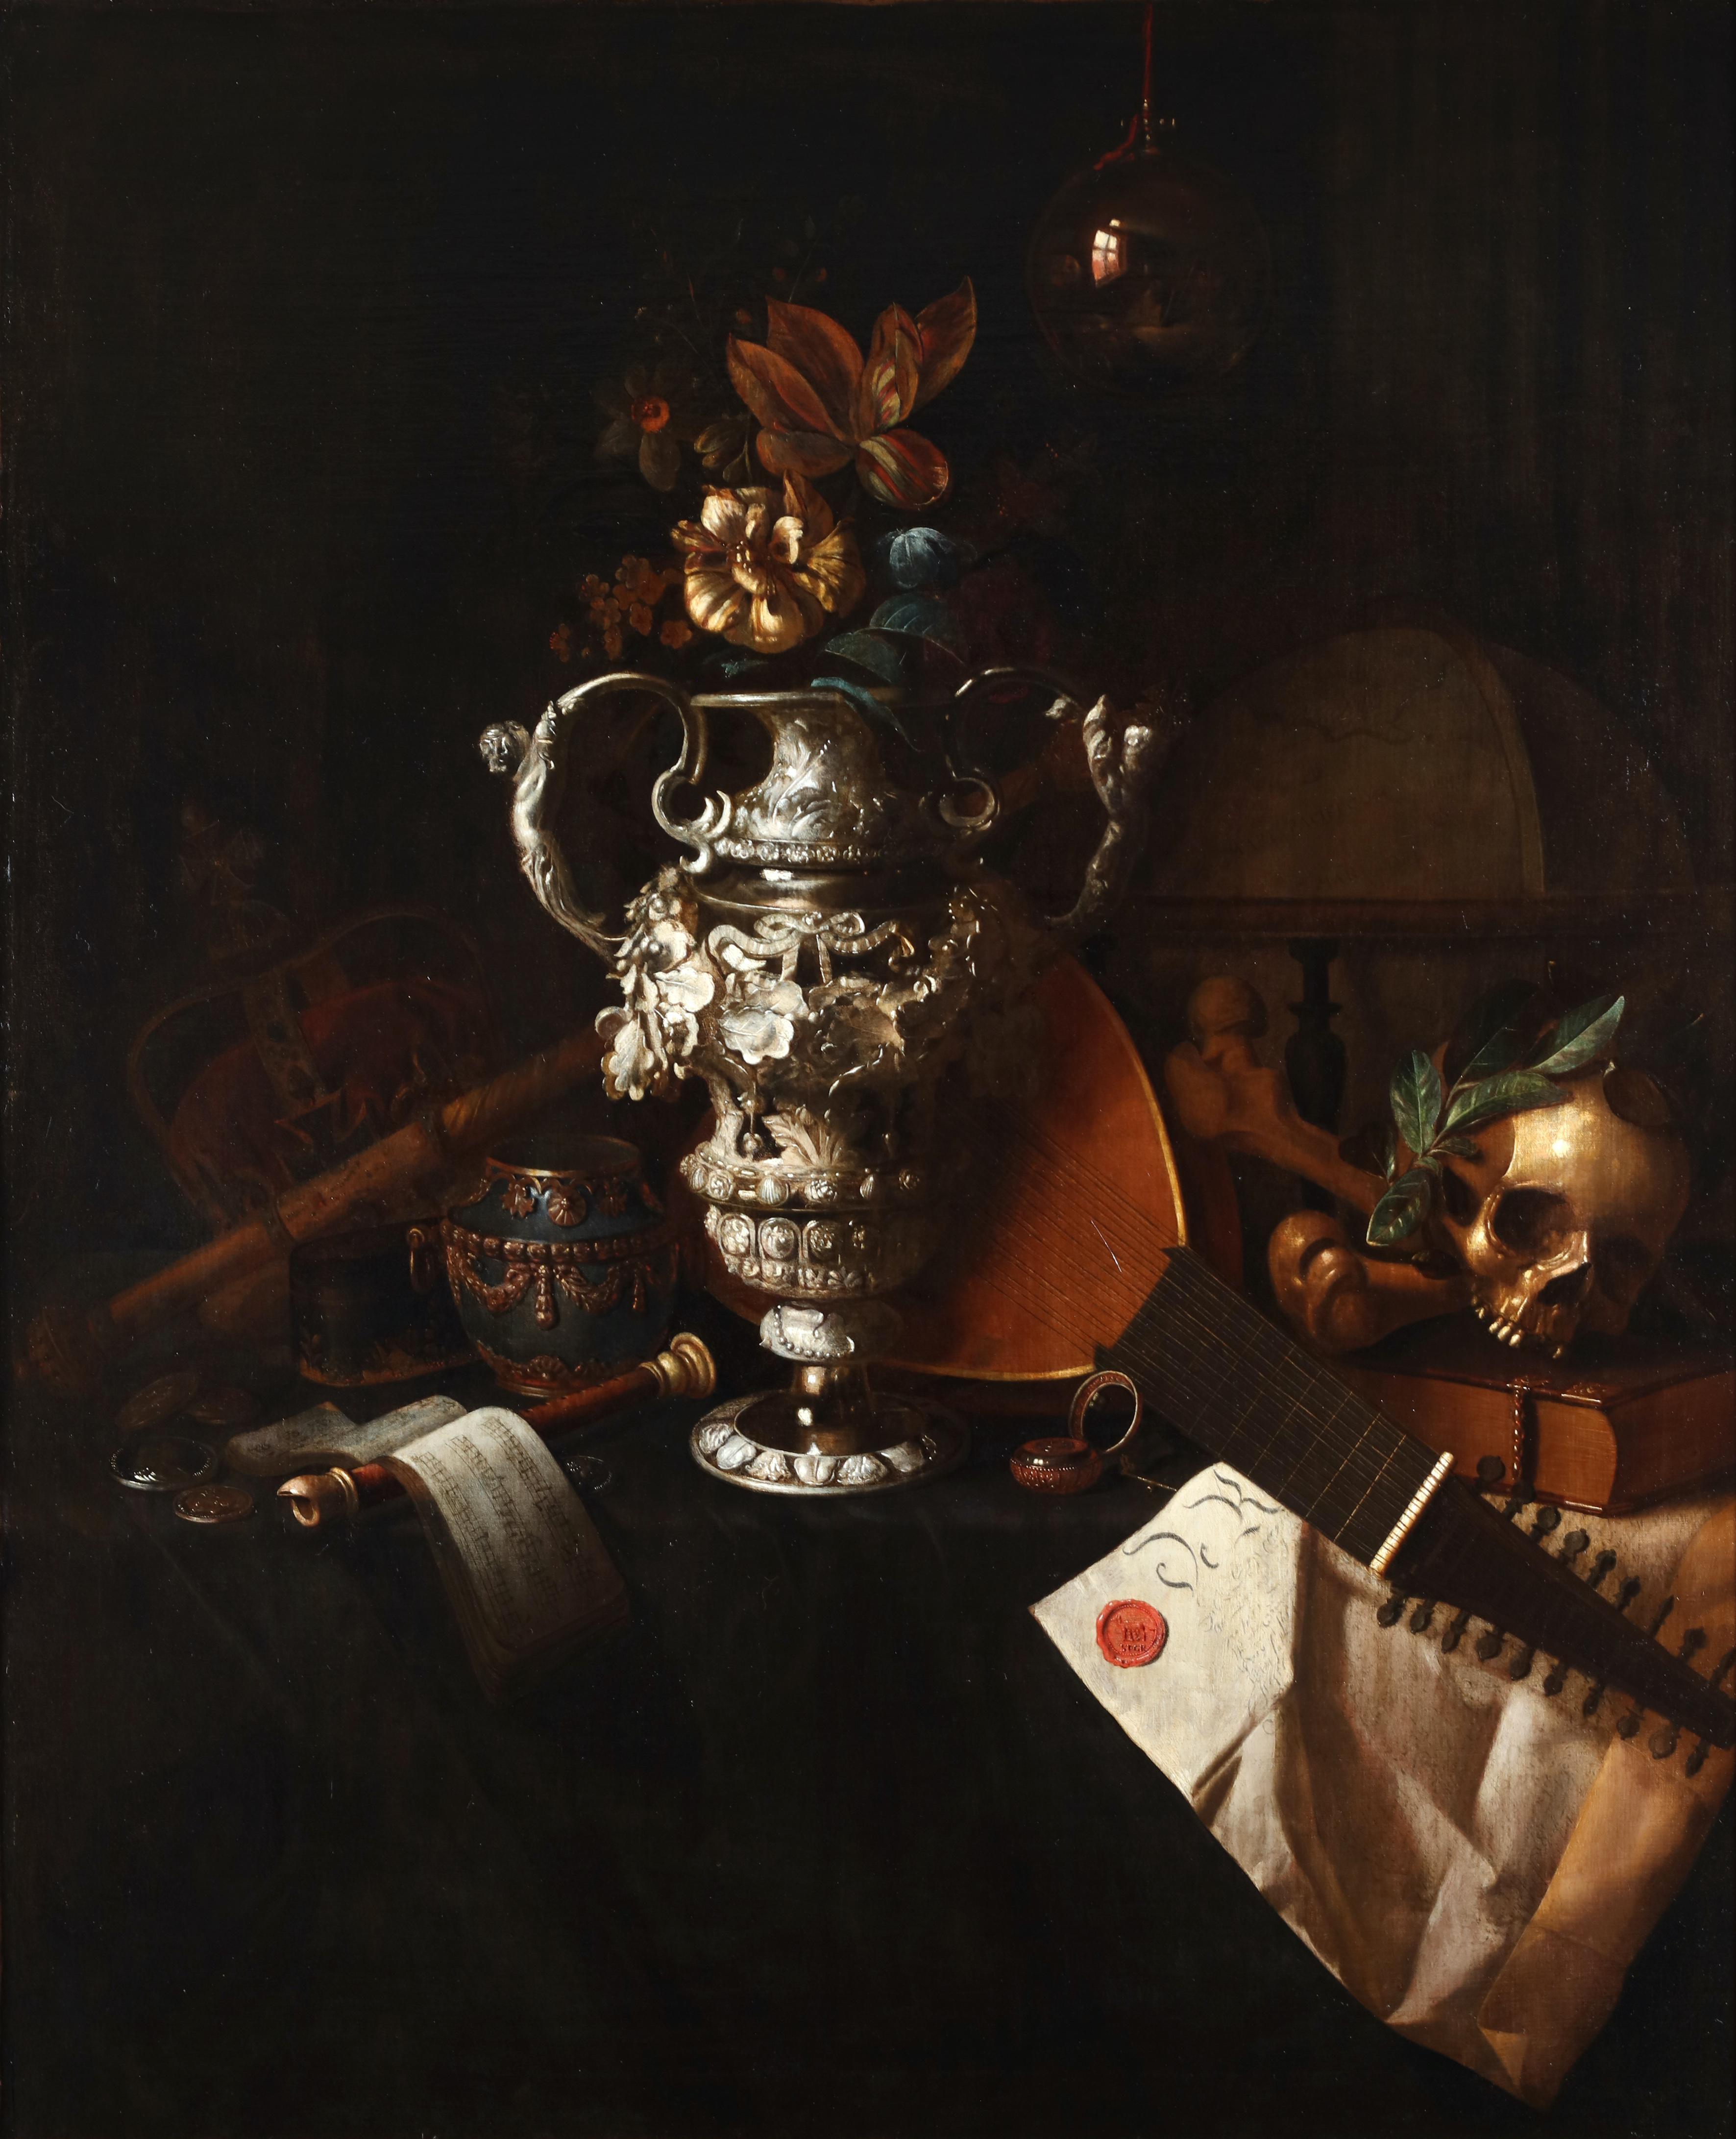 A vanitas still life with an elaborate silver vase